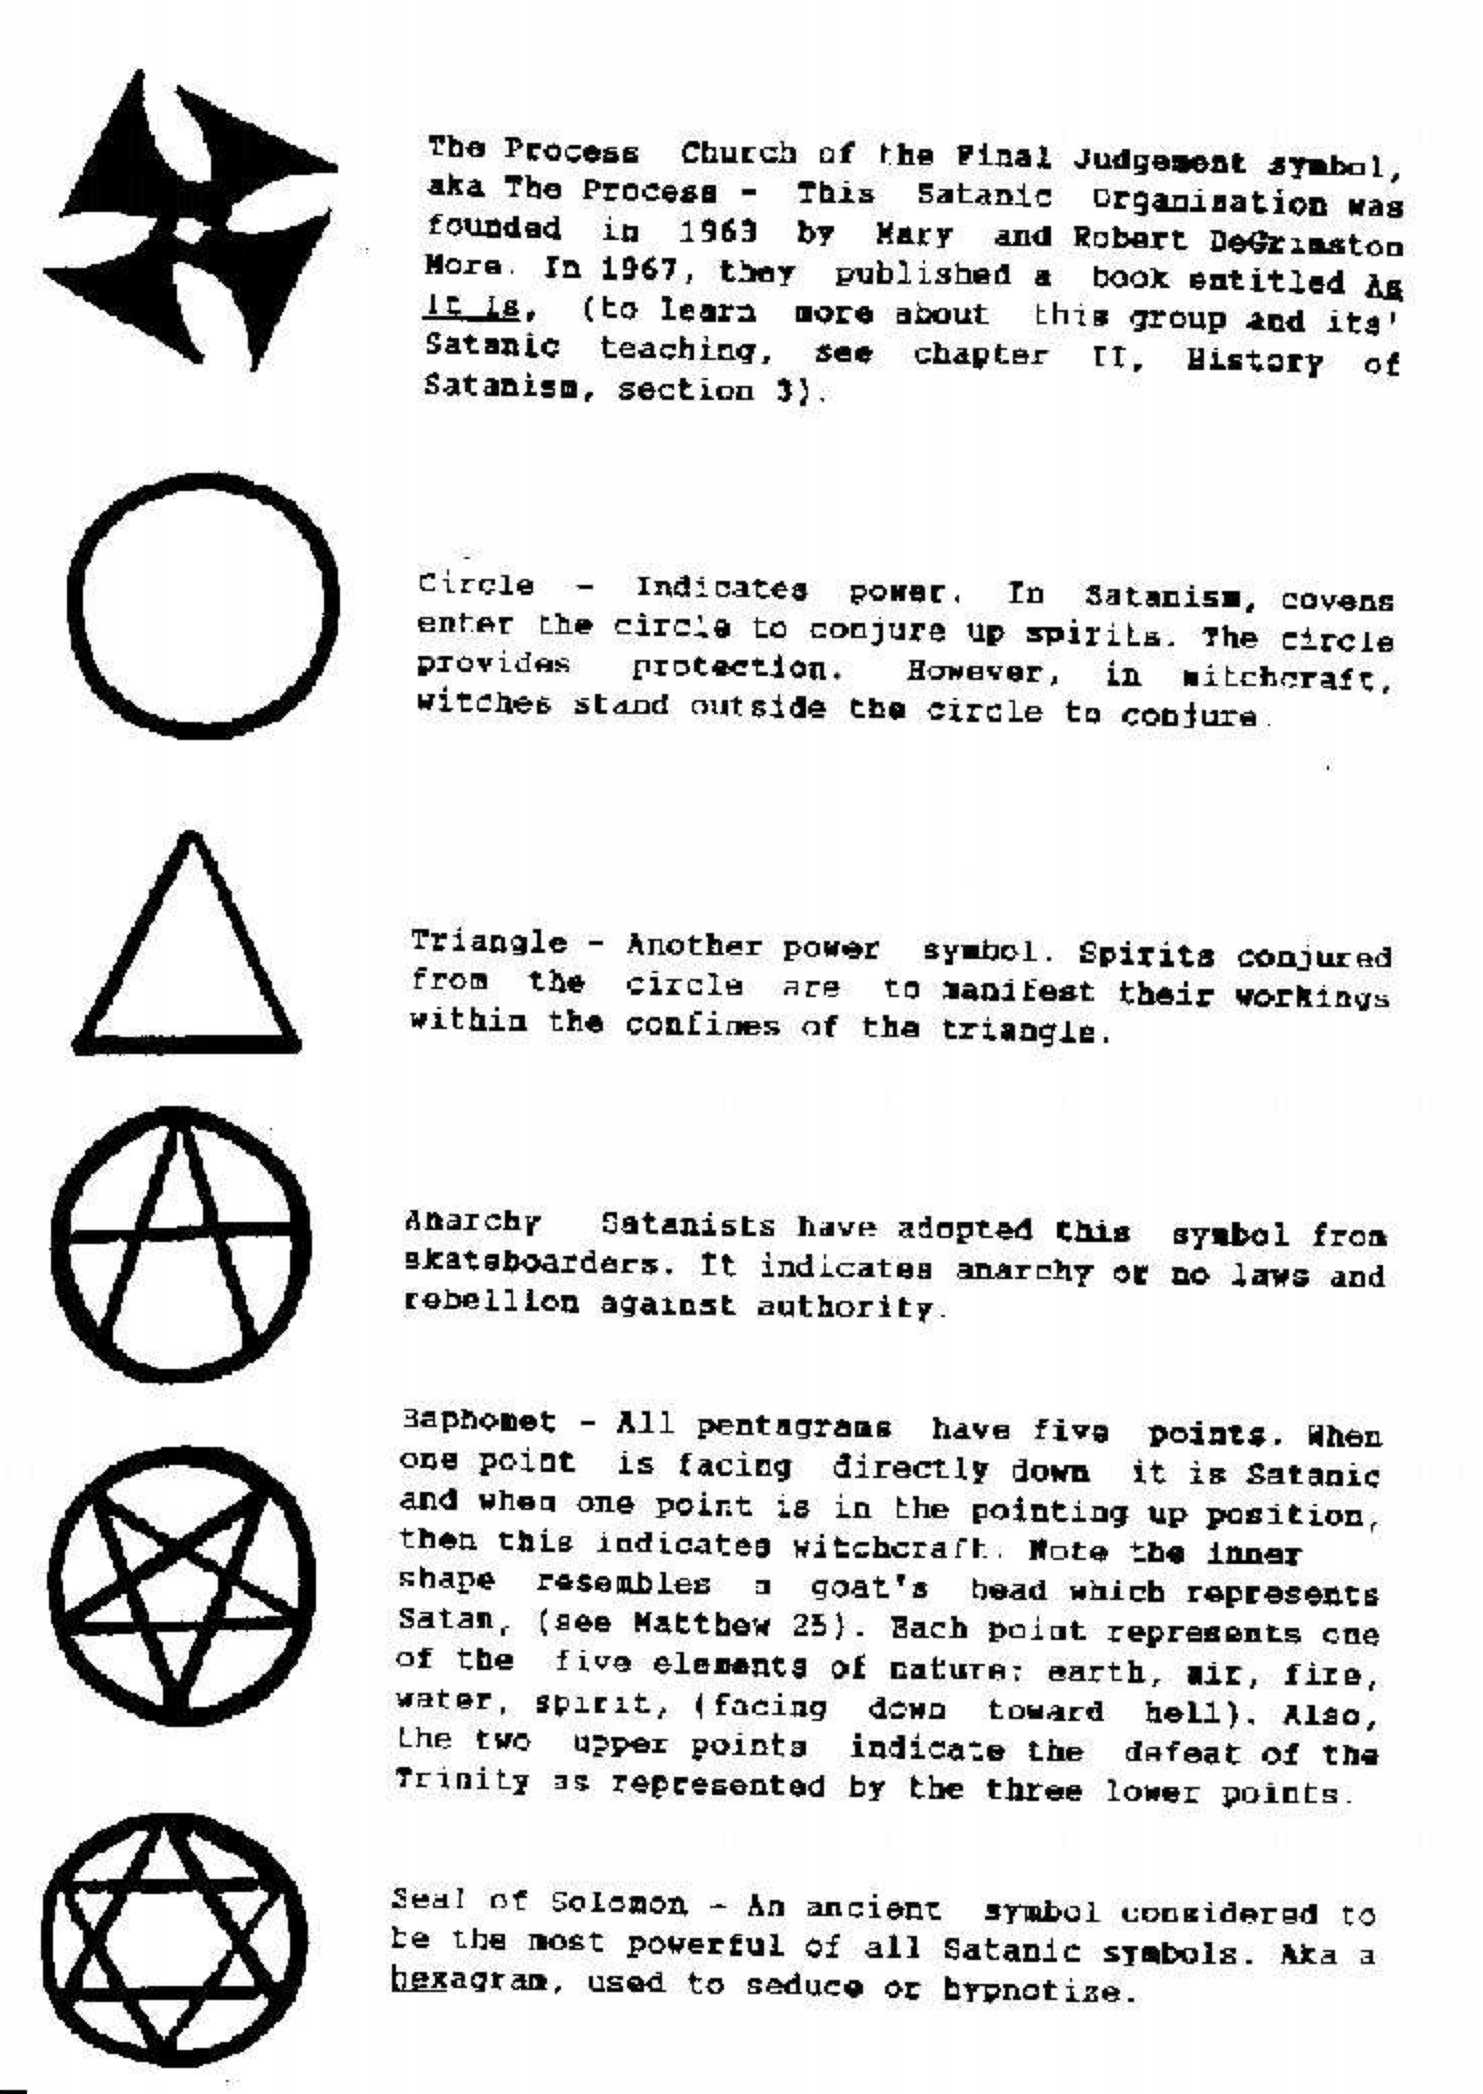 Satanic Malfunctions Who Wants The World EP